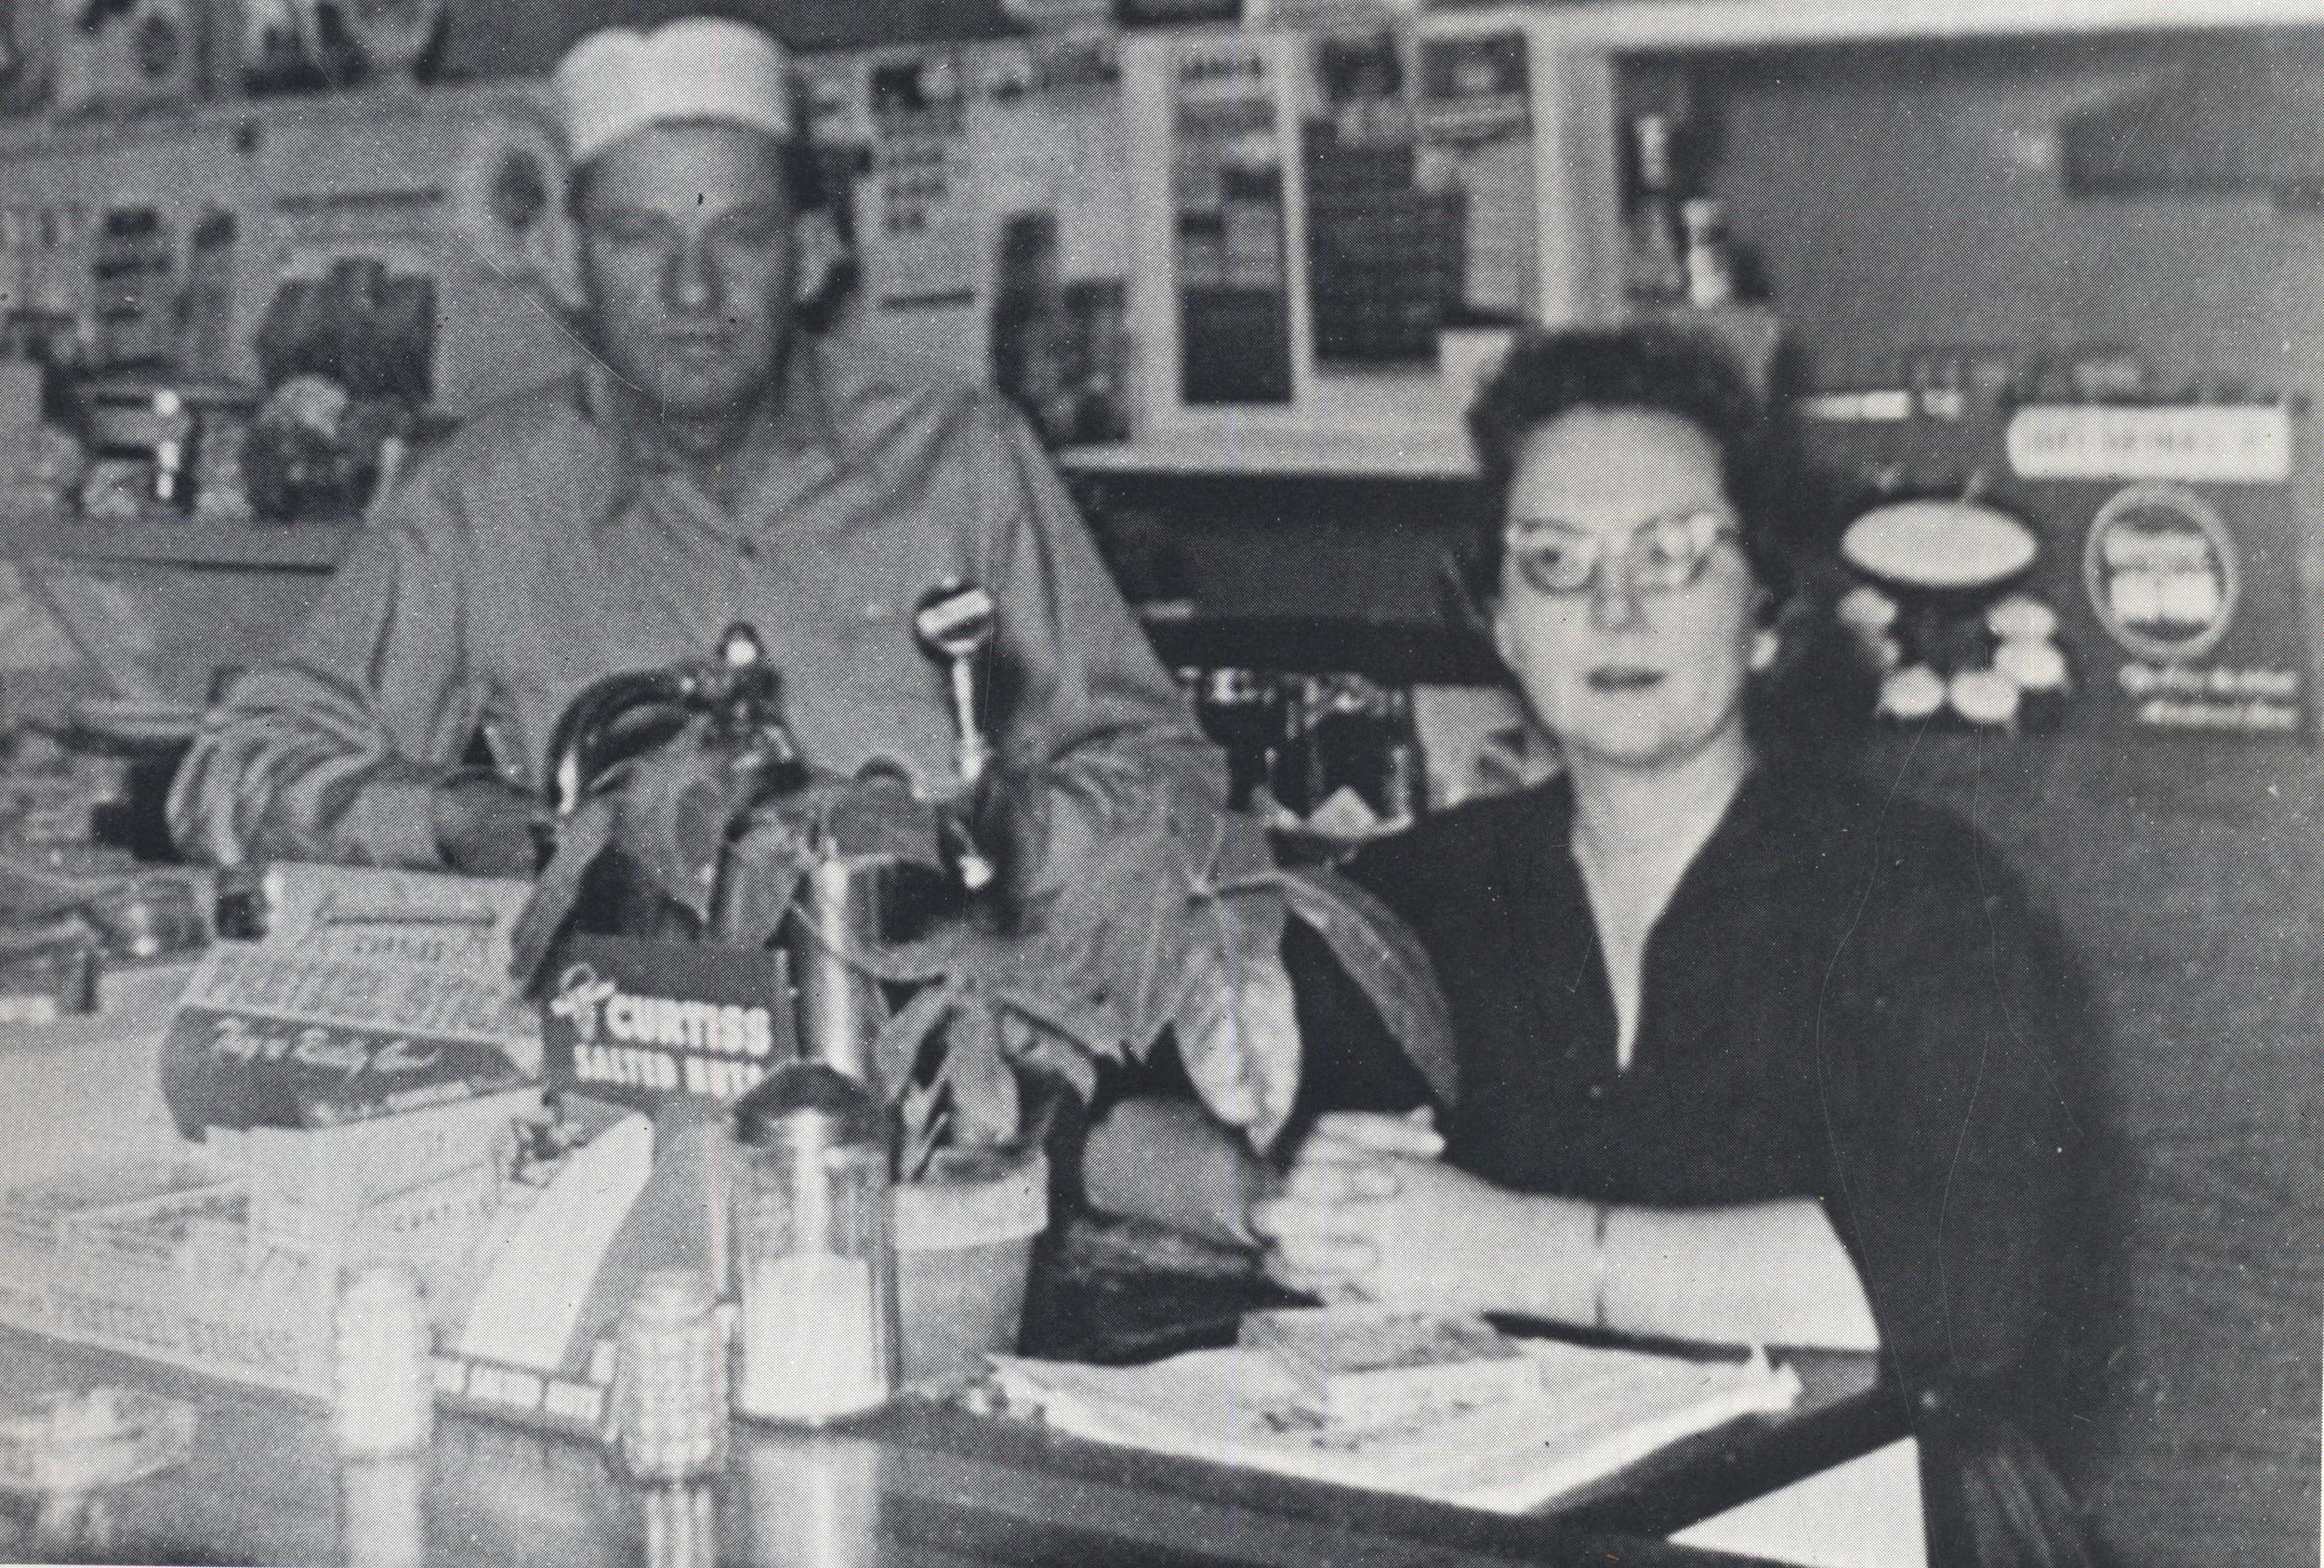 White Horse Cafe, 1950s